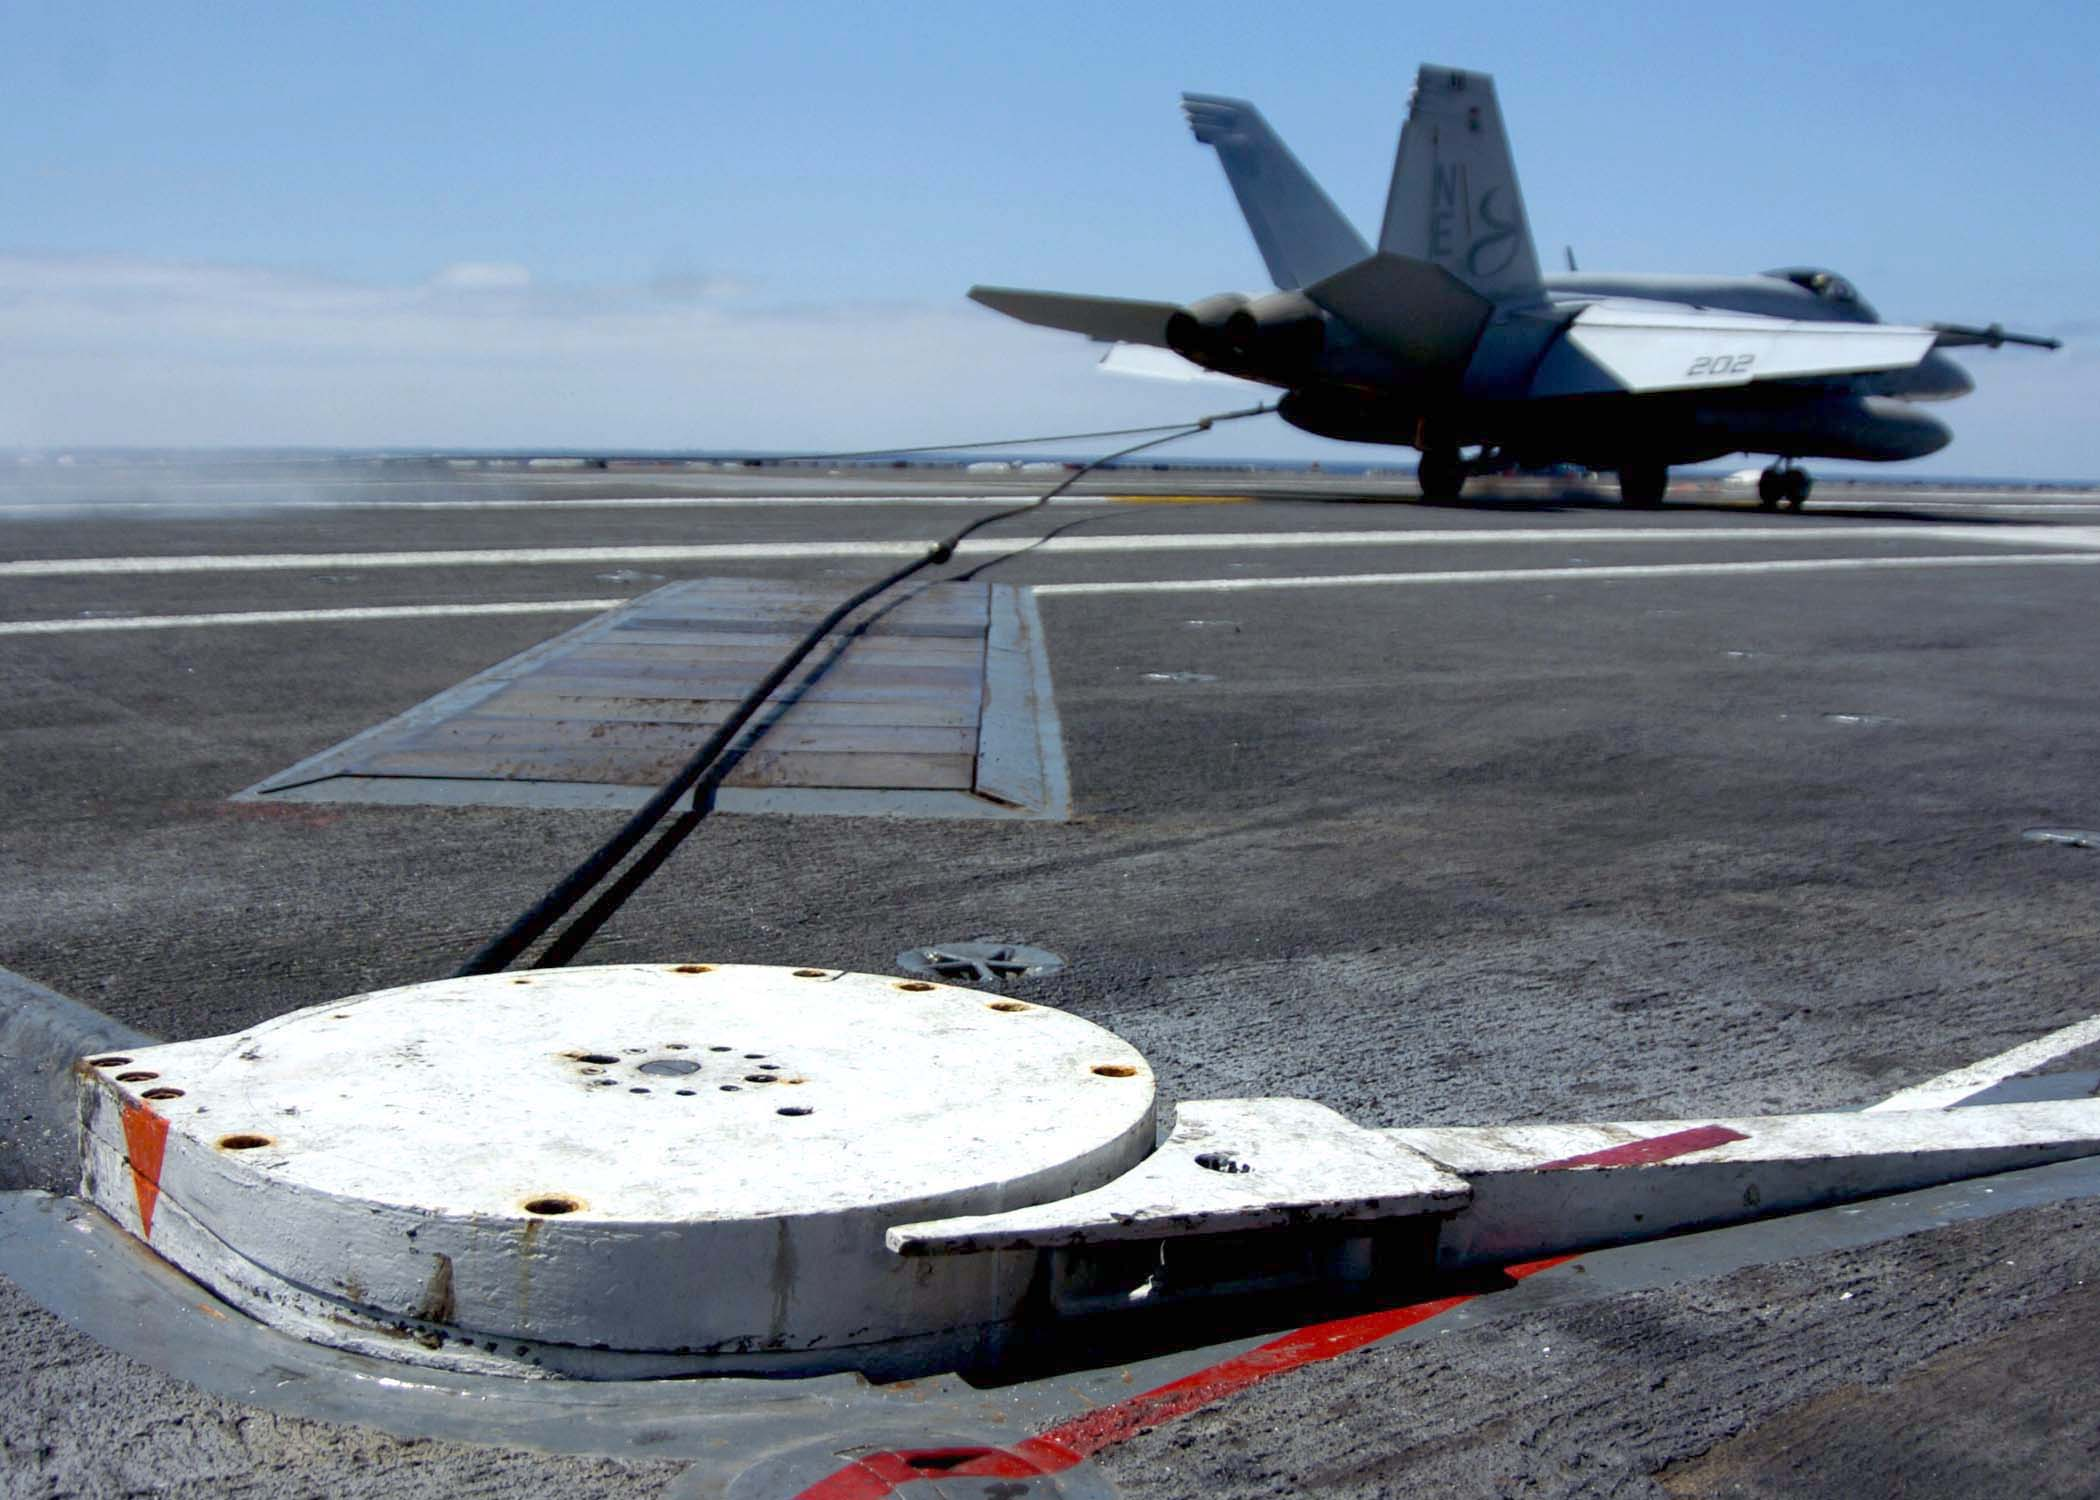 US_Navy_050913-N-5384B-337_An_F-A-18_Hornet_catches_the_arresting_gear_wire_on_the_flight_deck_aboard_the_Nimitz-class_Carrier_USS_Abraham_Lincoln_%28CVN_72%29.jpg